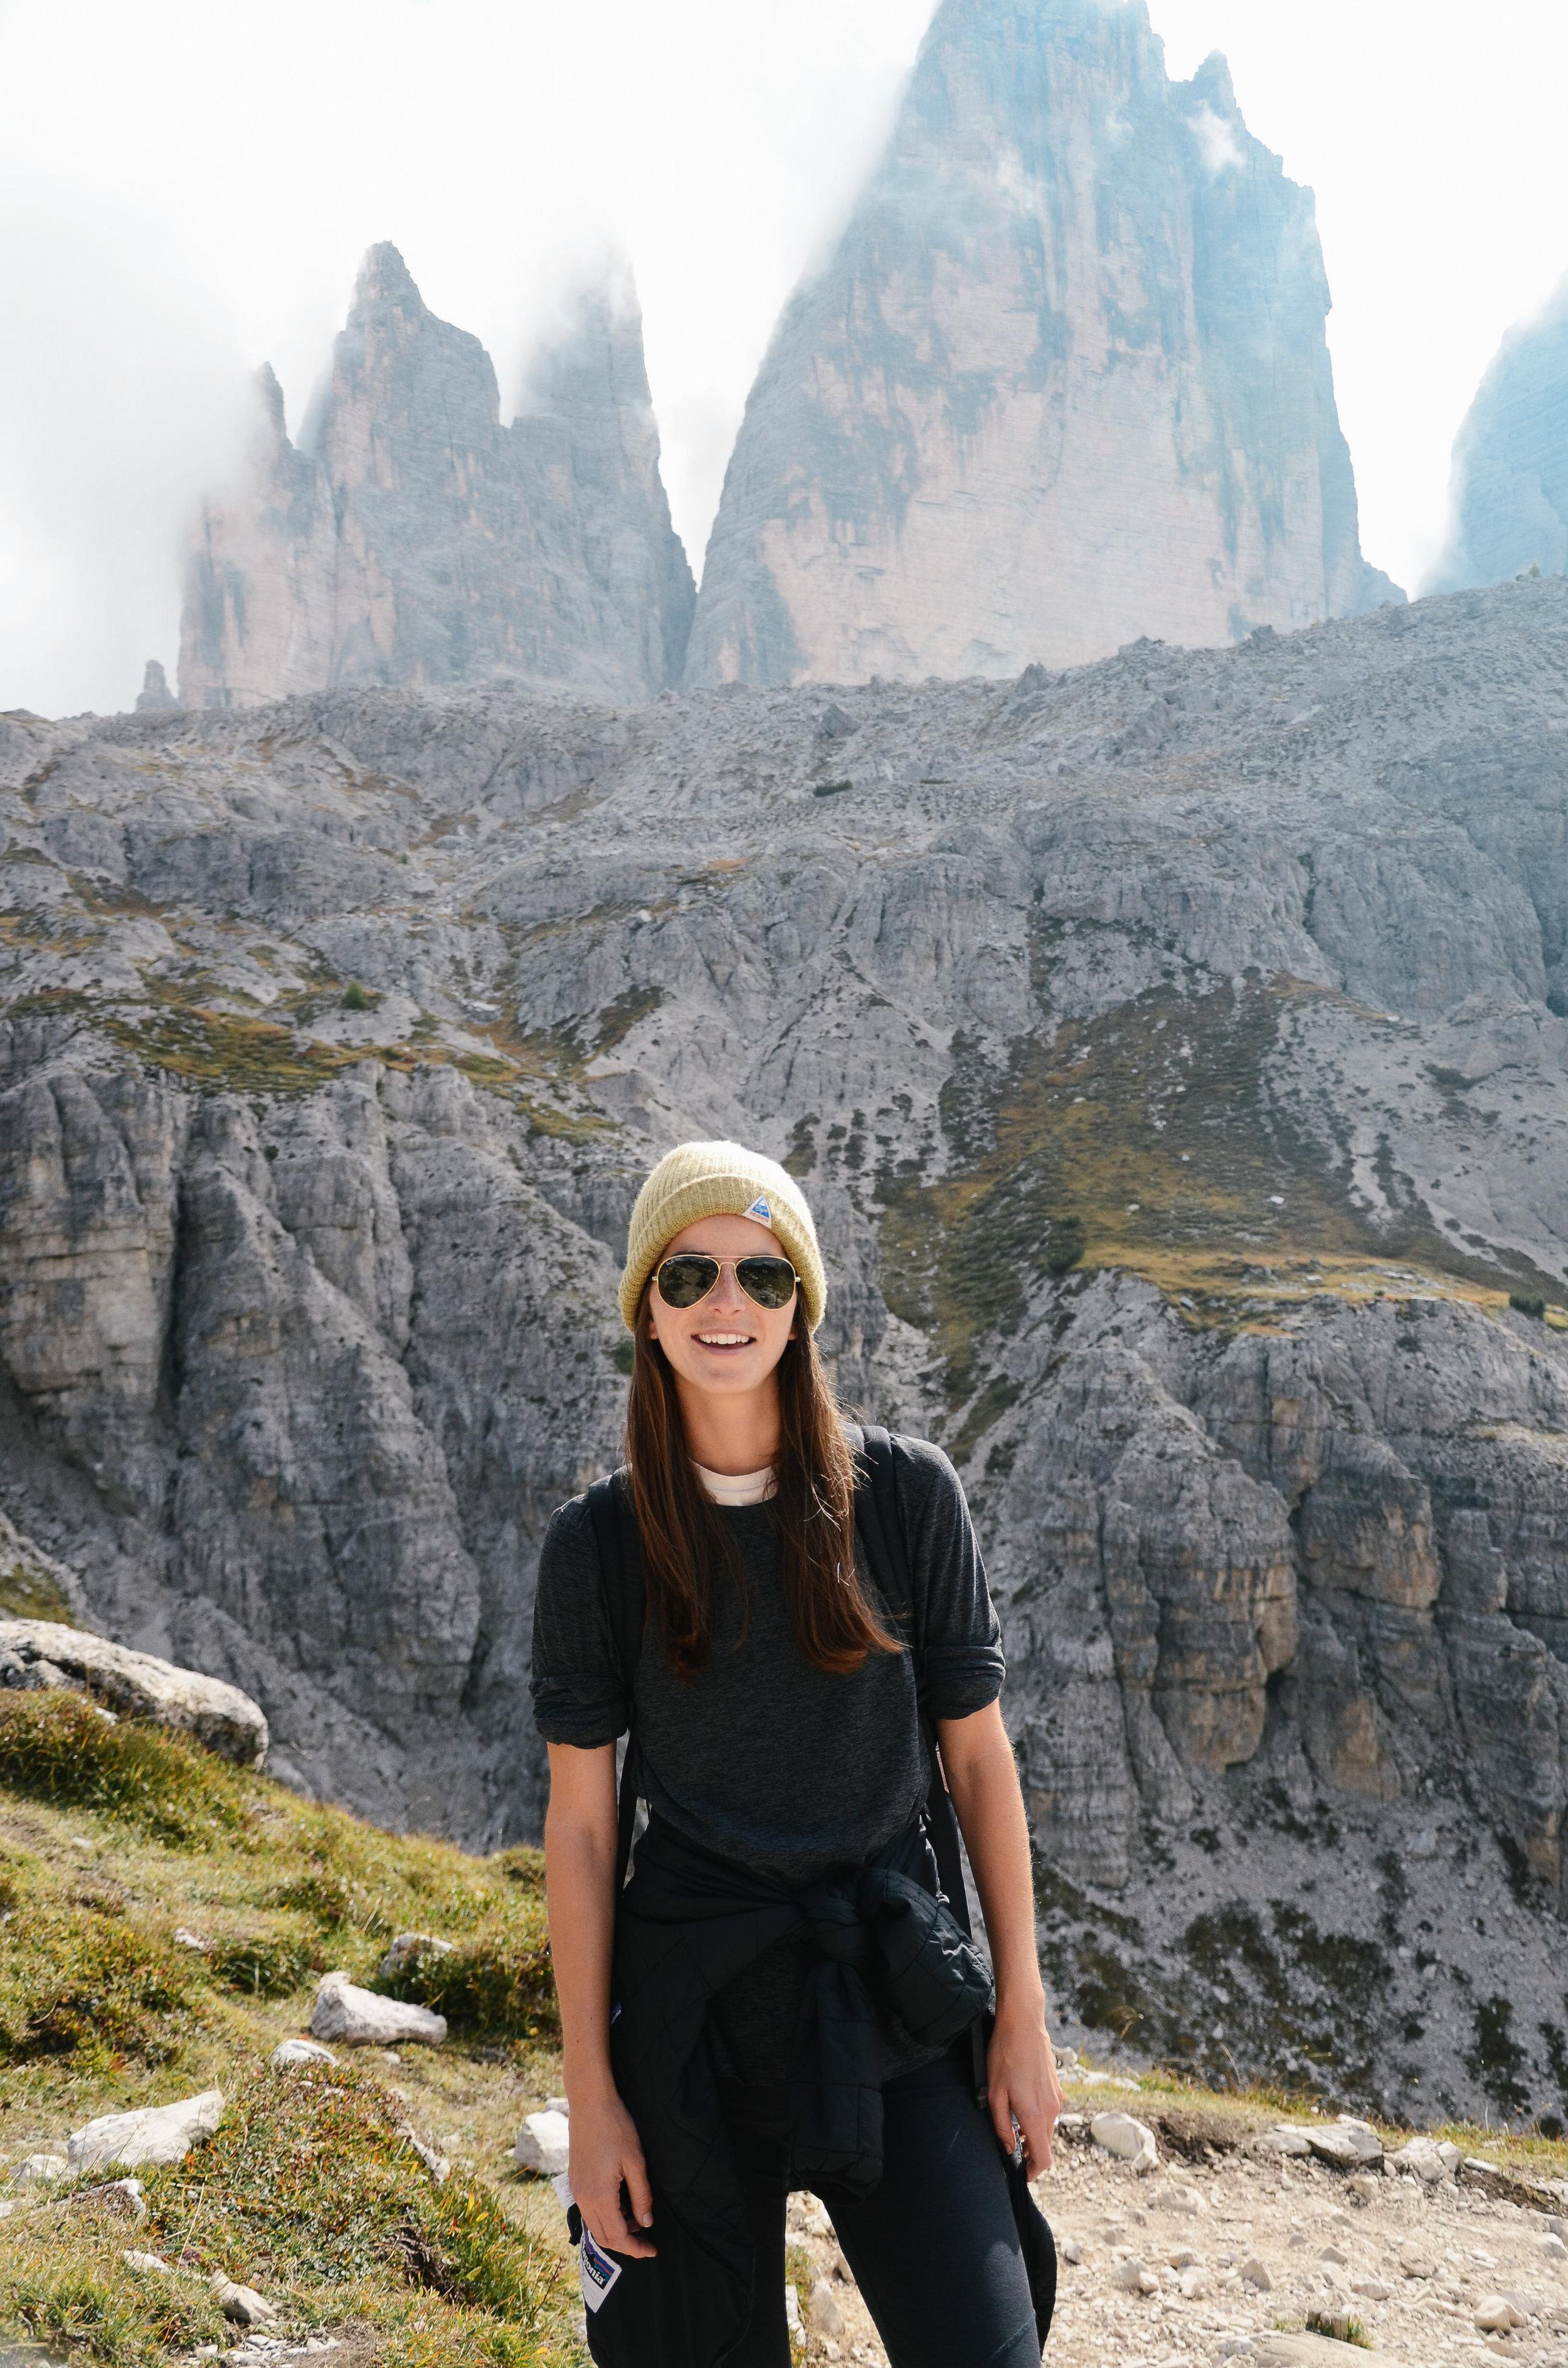 adventure-in-italy-3-hikes-dolomites-hiking-travel-blog-tyrol-10.jpg